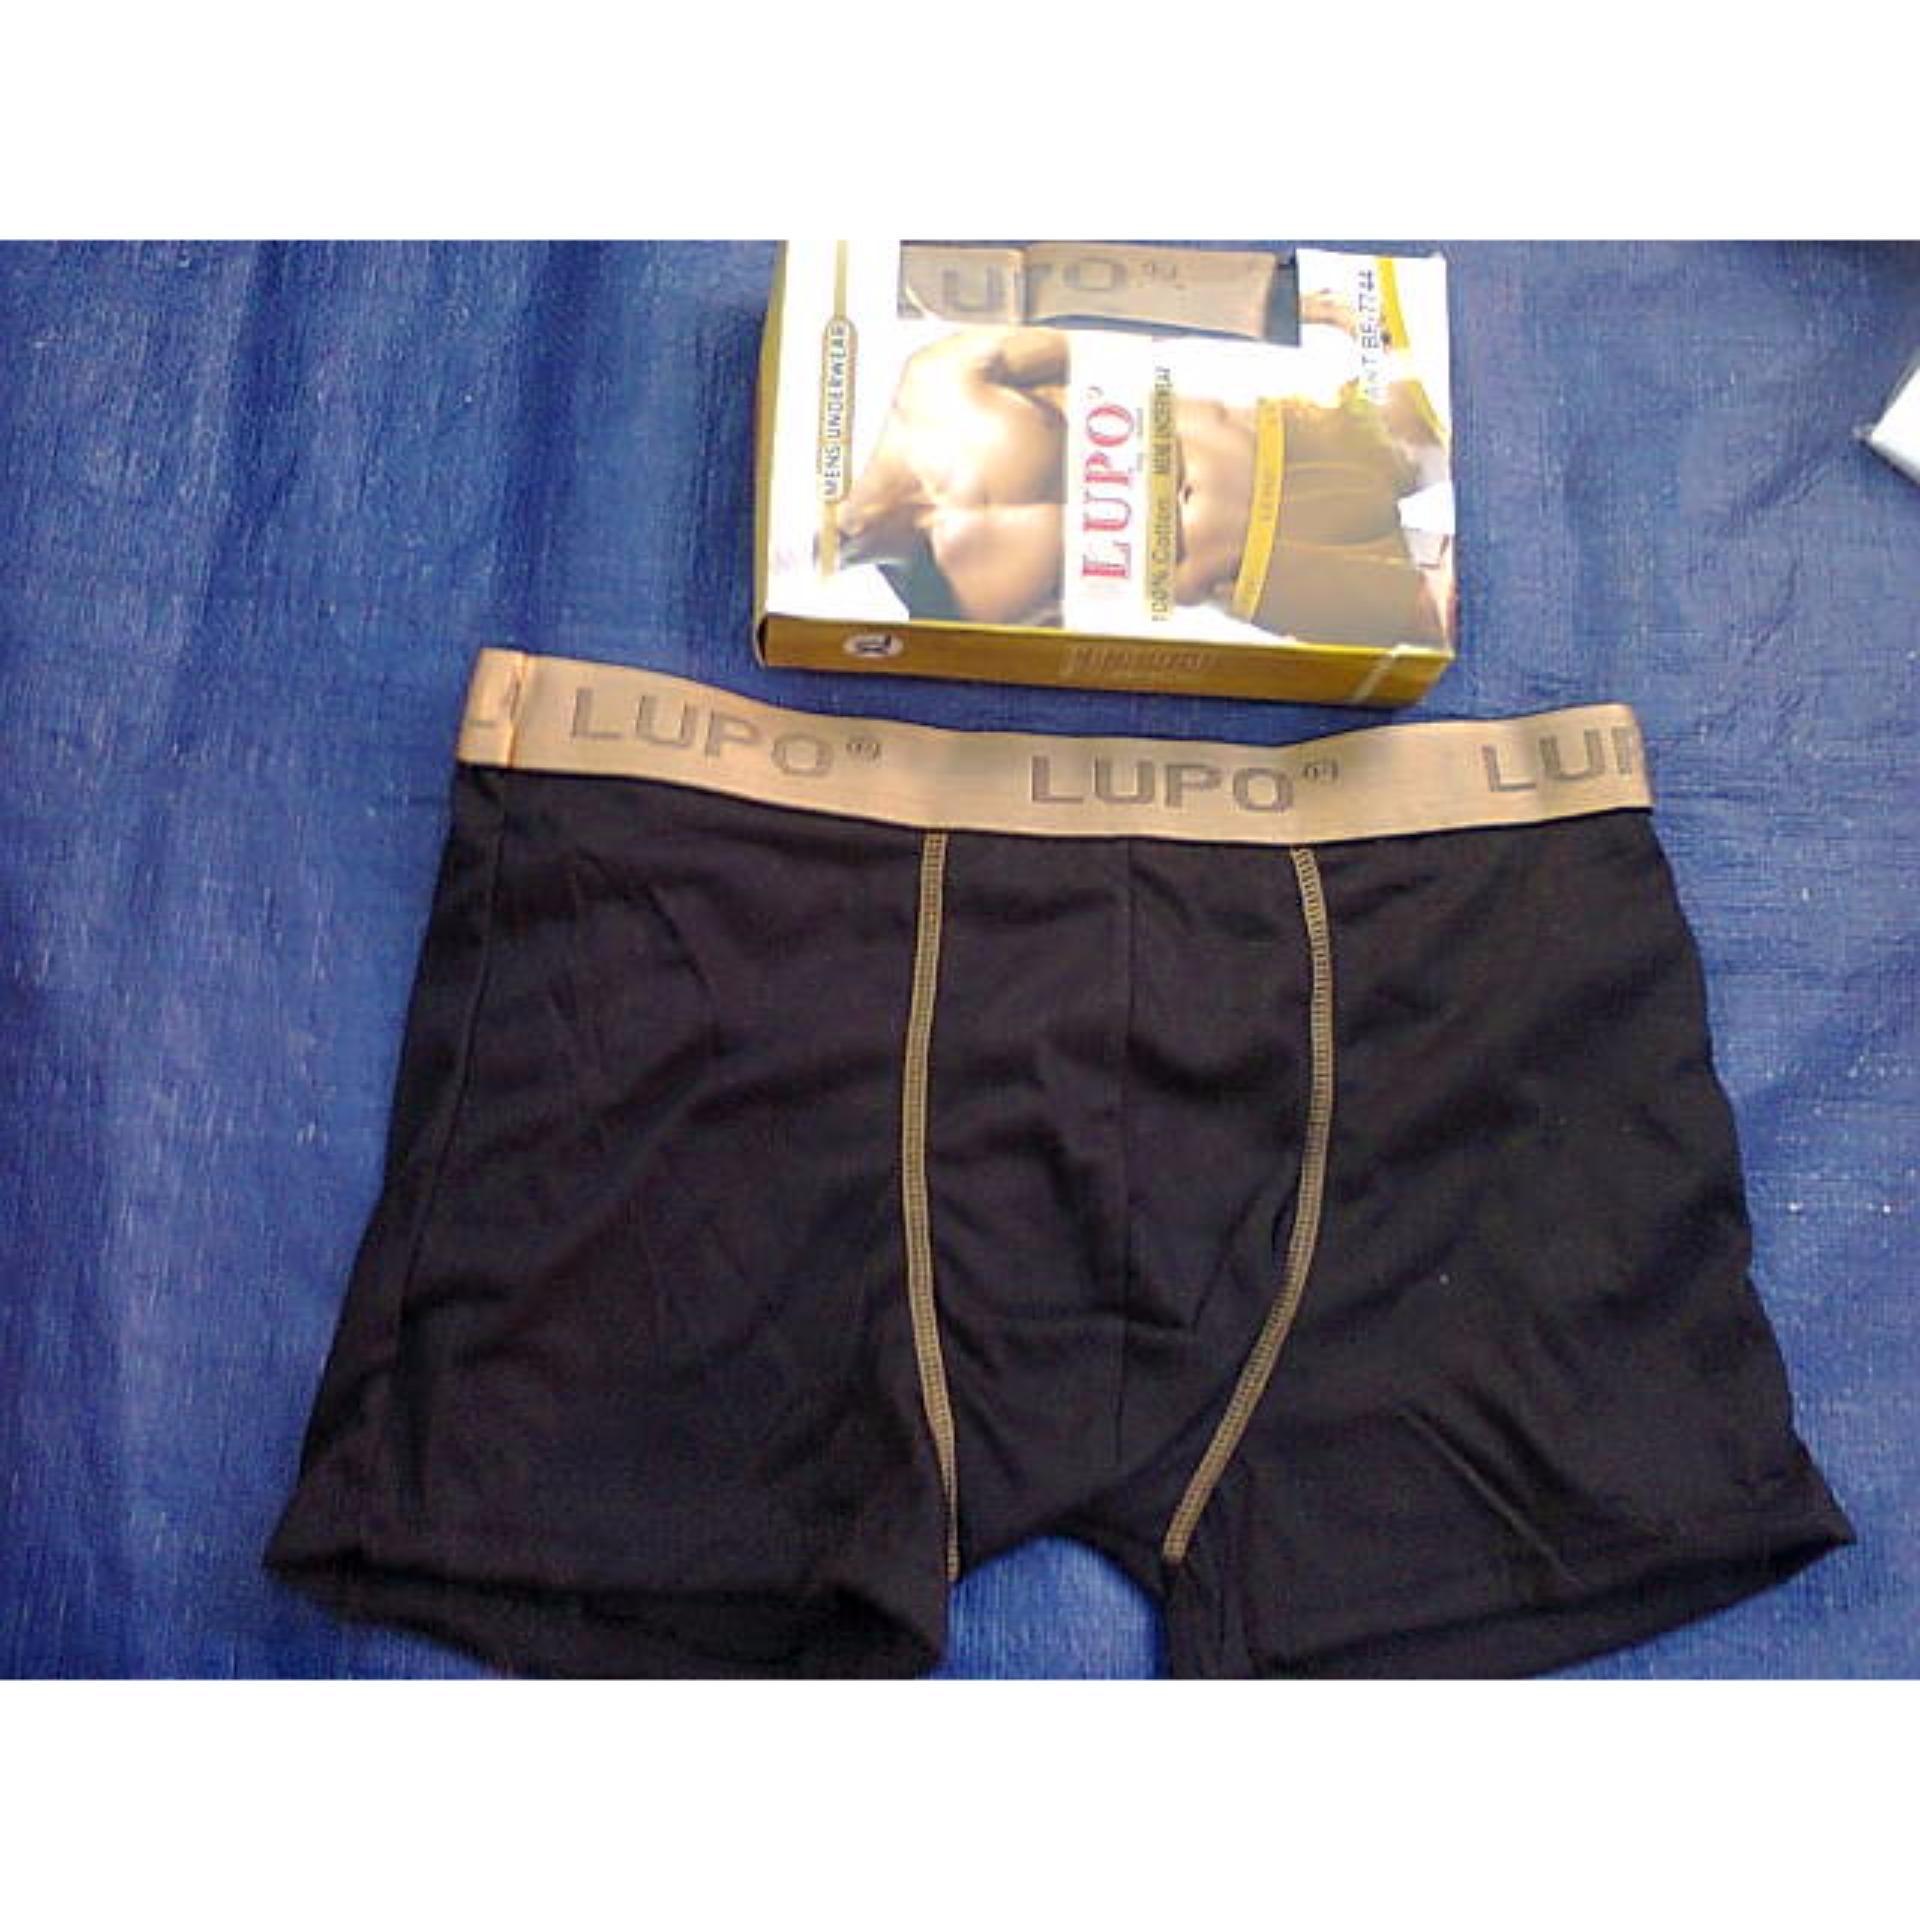 ... Celana Dalam Pria Boxer Sempak Underwear Pakaian Dalam Boxer Size  L-multicolour 443efbc525